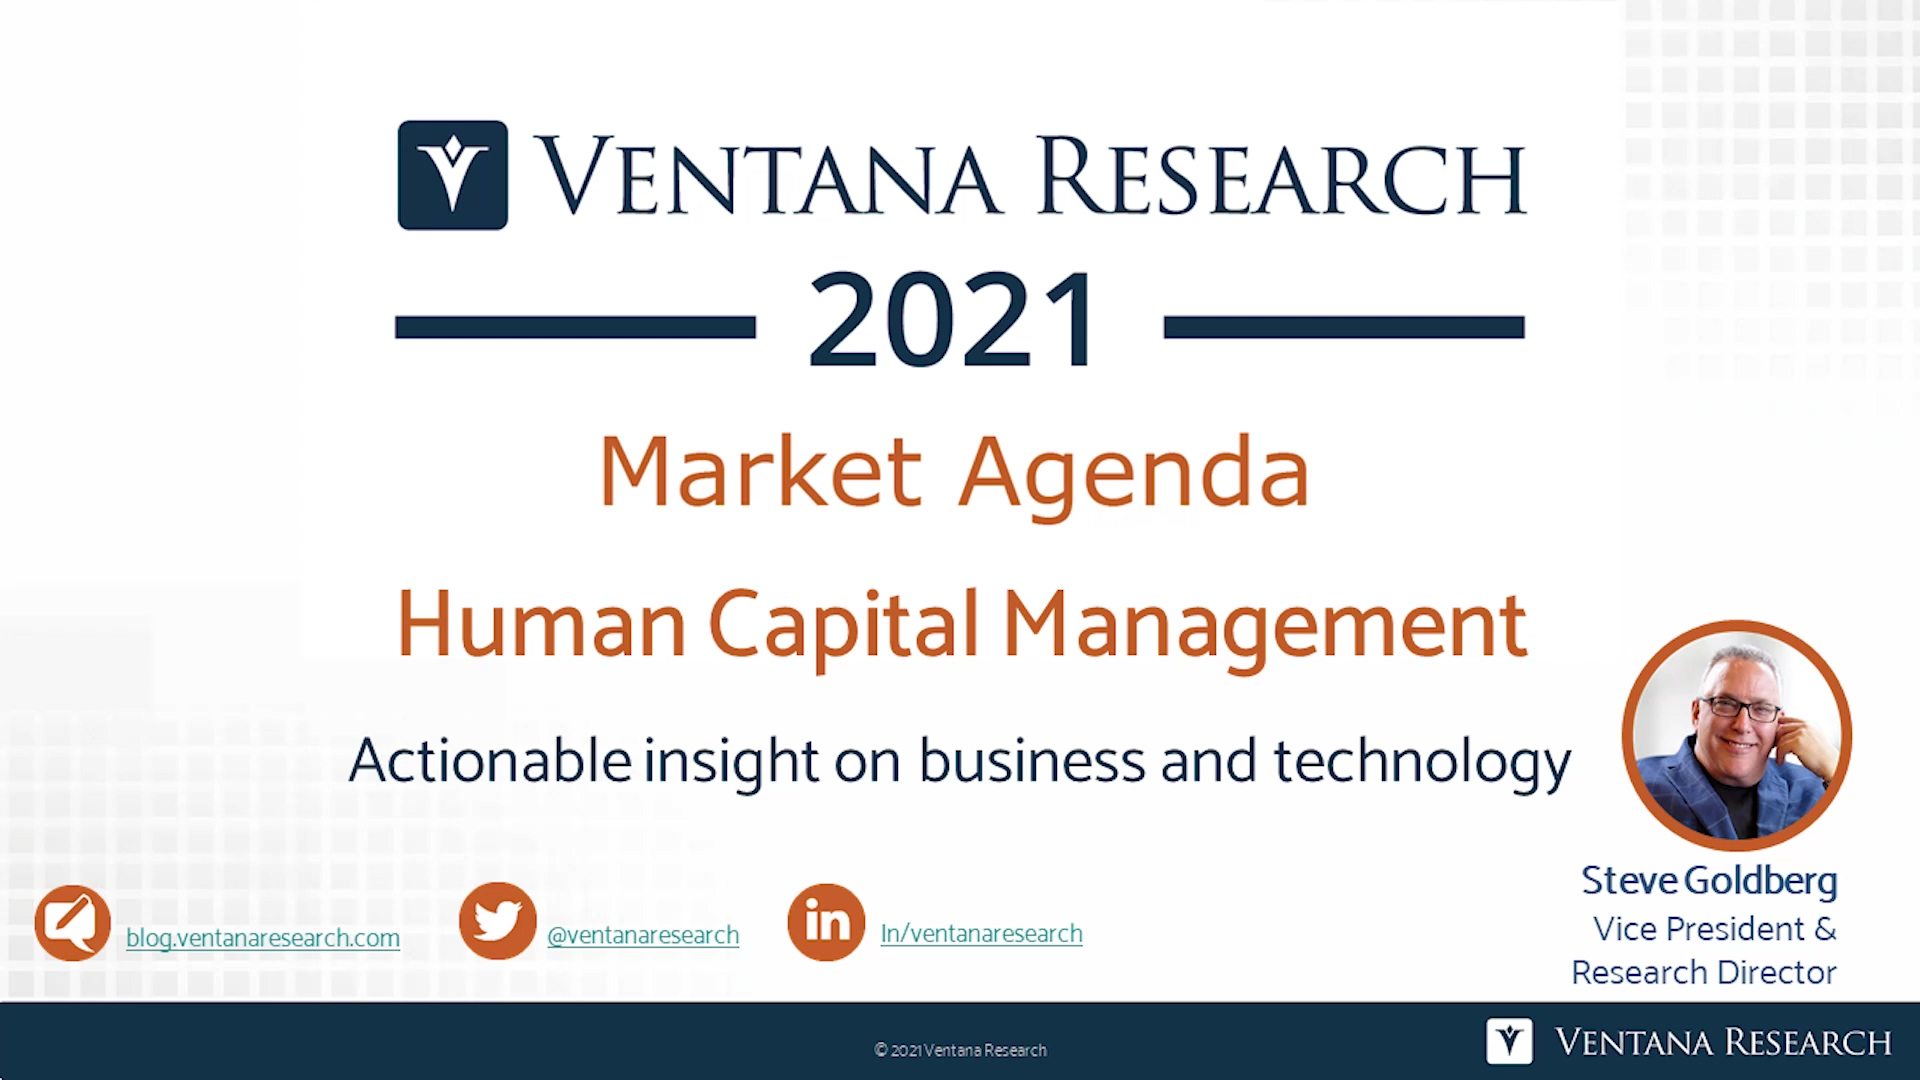 Ventana Research 2021 Market Agenda for HCM